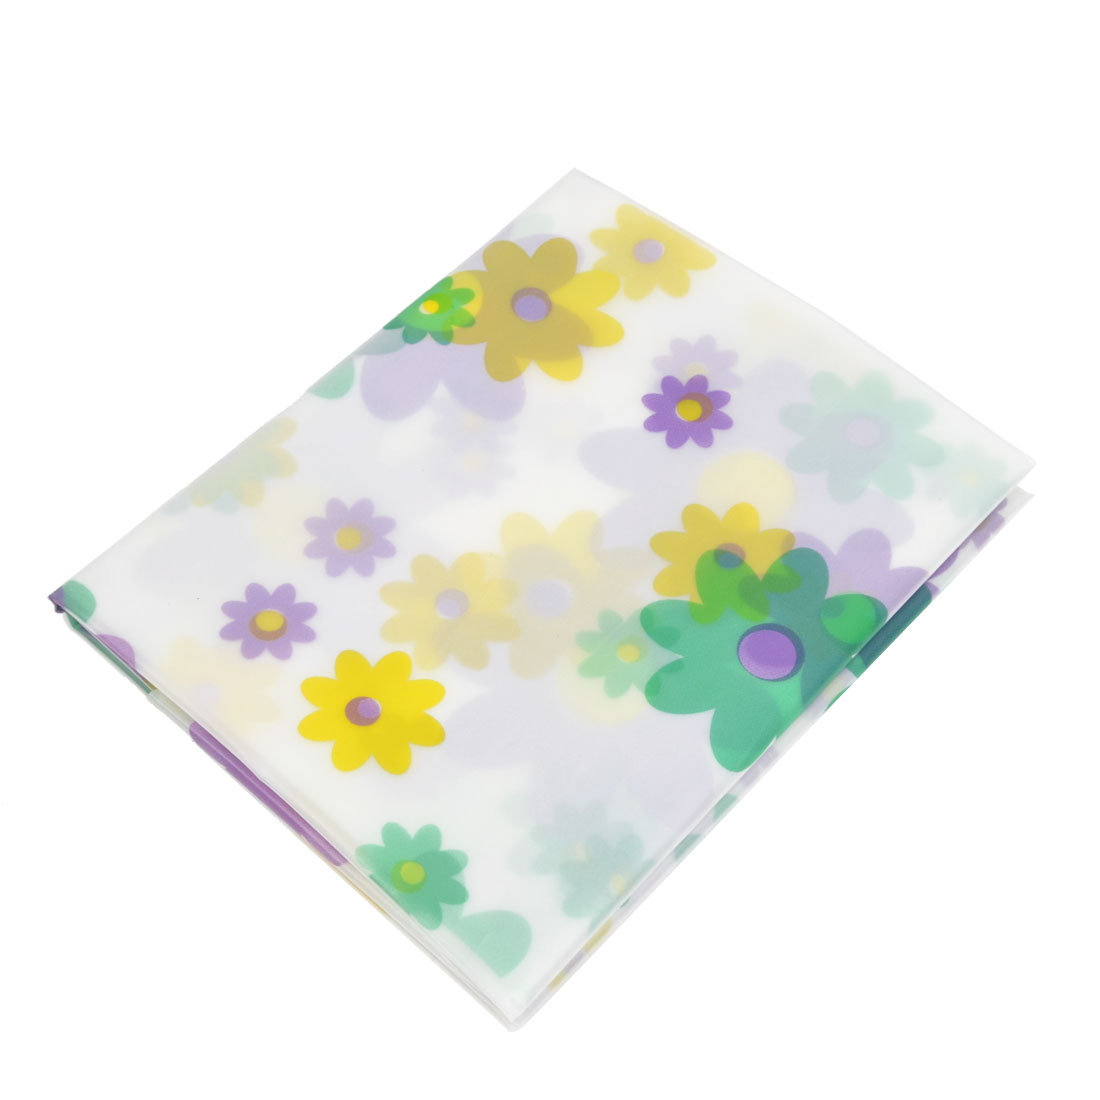 "Bathroom Waterproof Floral Print Plastic Bath Shower Curtain 71"" x 71"""